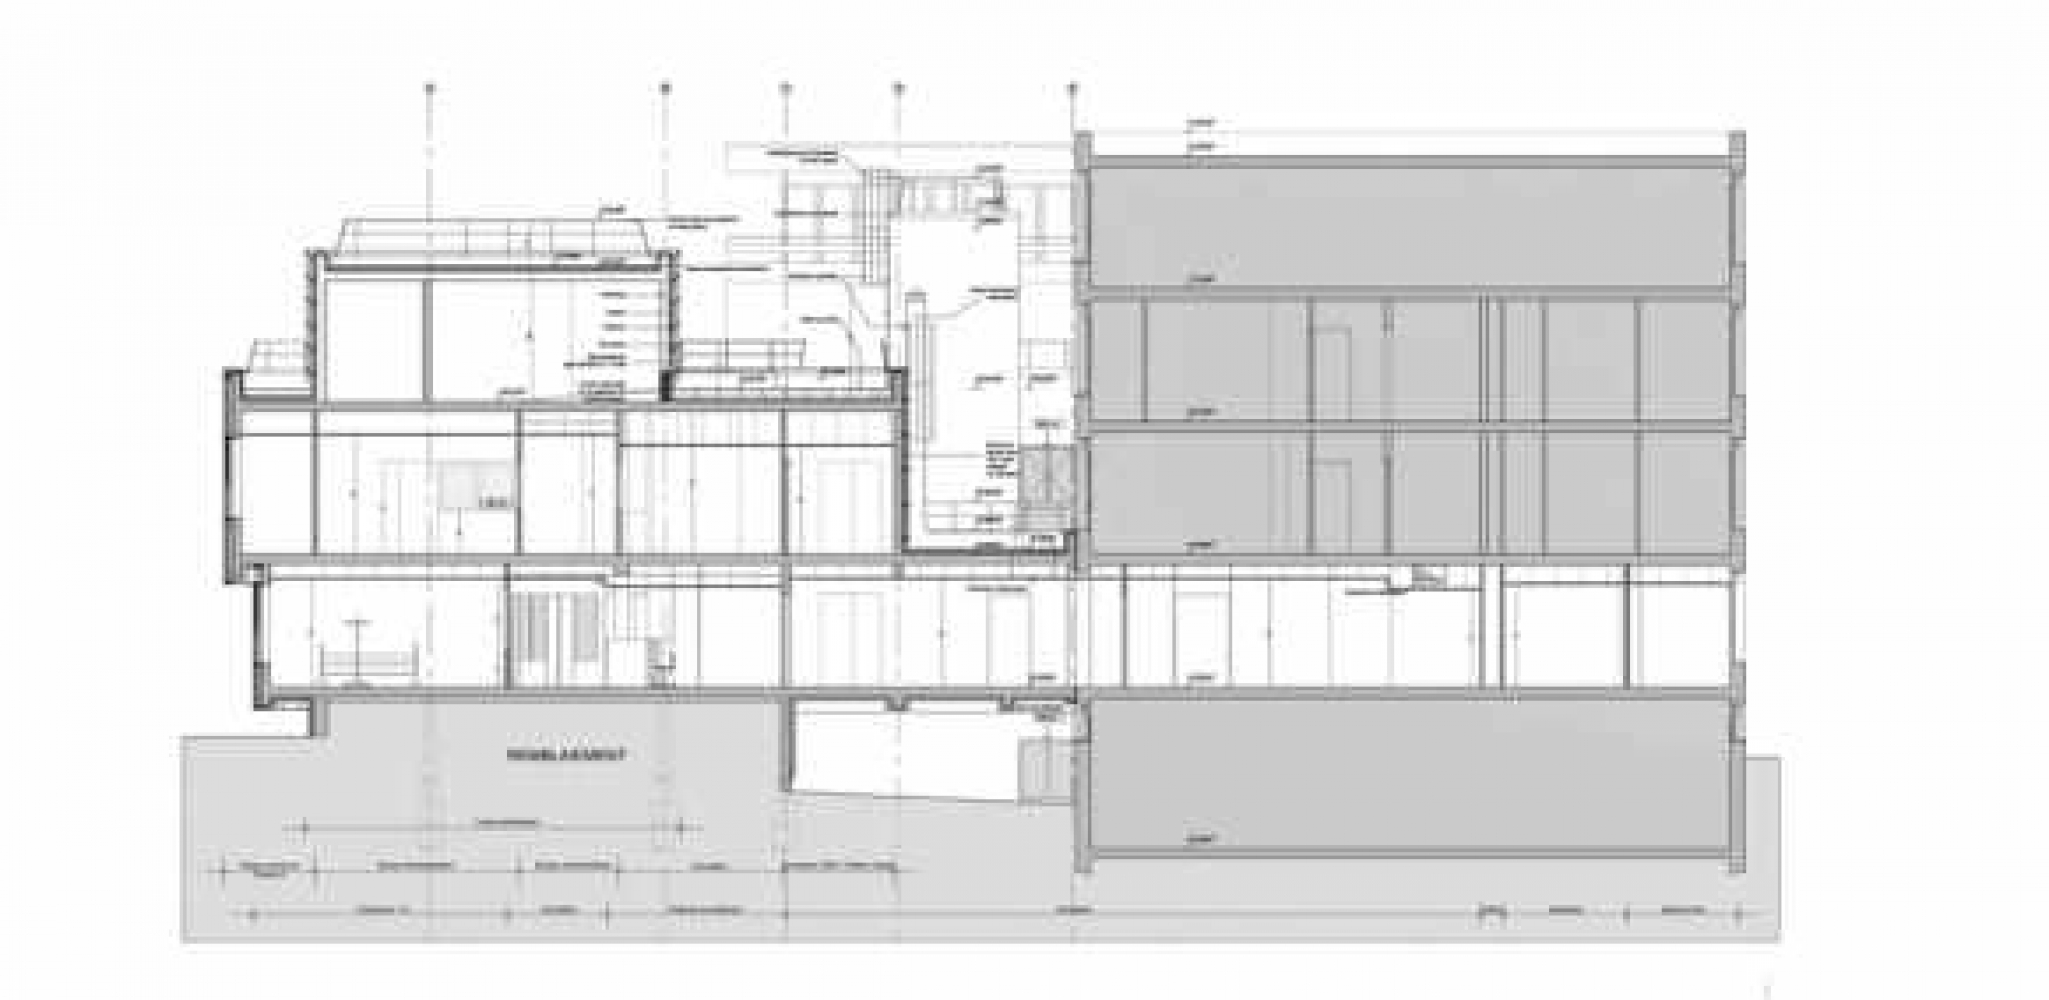 zlag_redim01 Pascale SEURIN Architecte - Pascale SEURIN Architecte